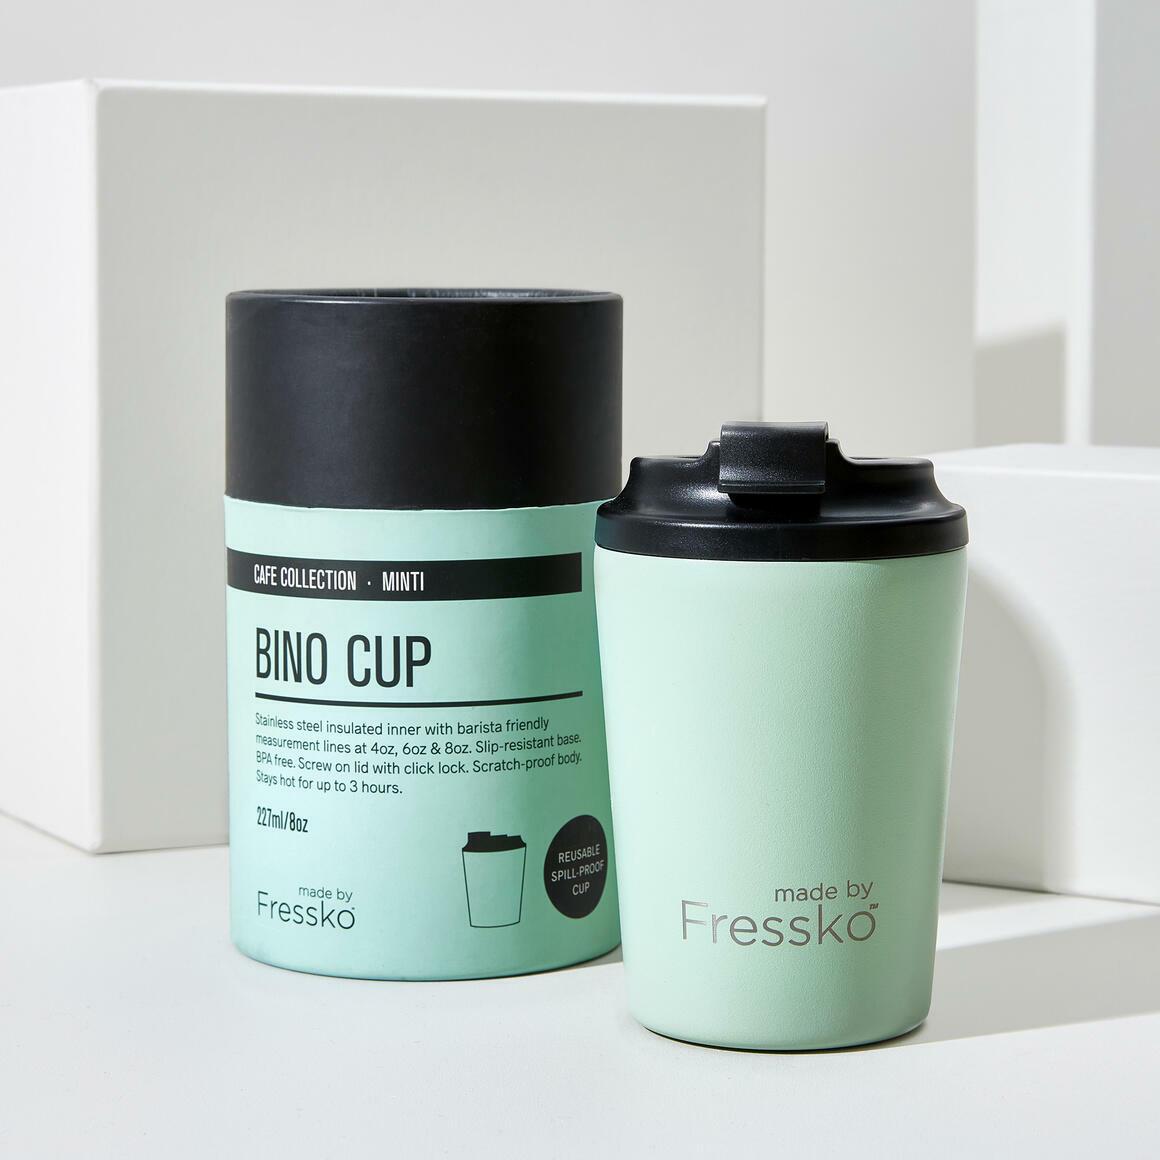 Fressko BINO 8oz Stainless Steel Reusable Cup  MINT | Trada Marketplace